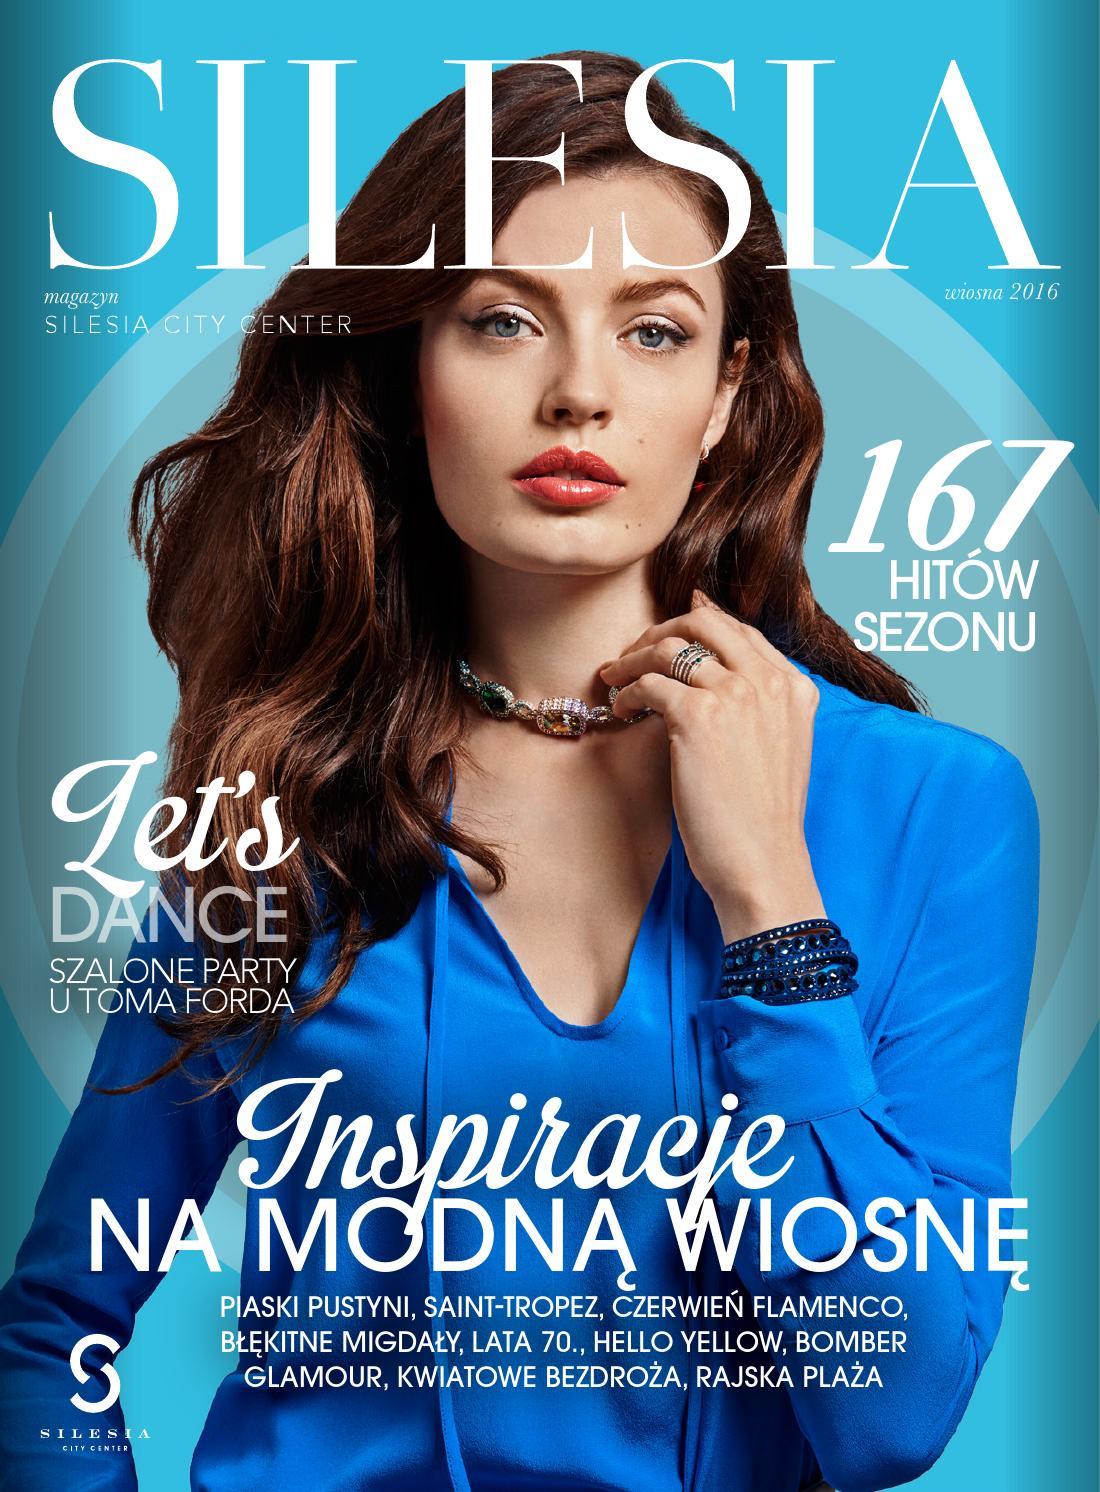 fef621b6d0f036 SILESIA wiosna 2016 by POLA Design - issuu